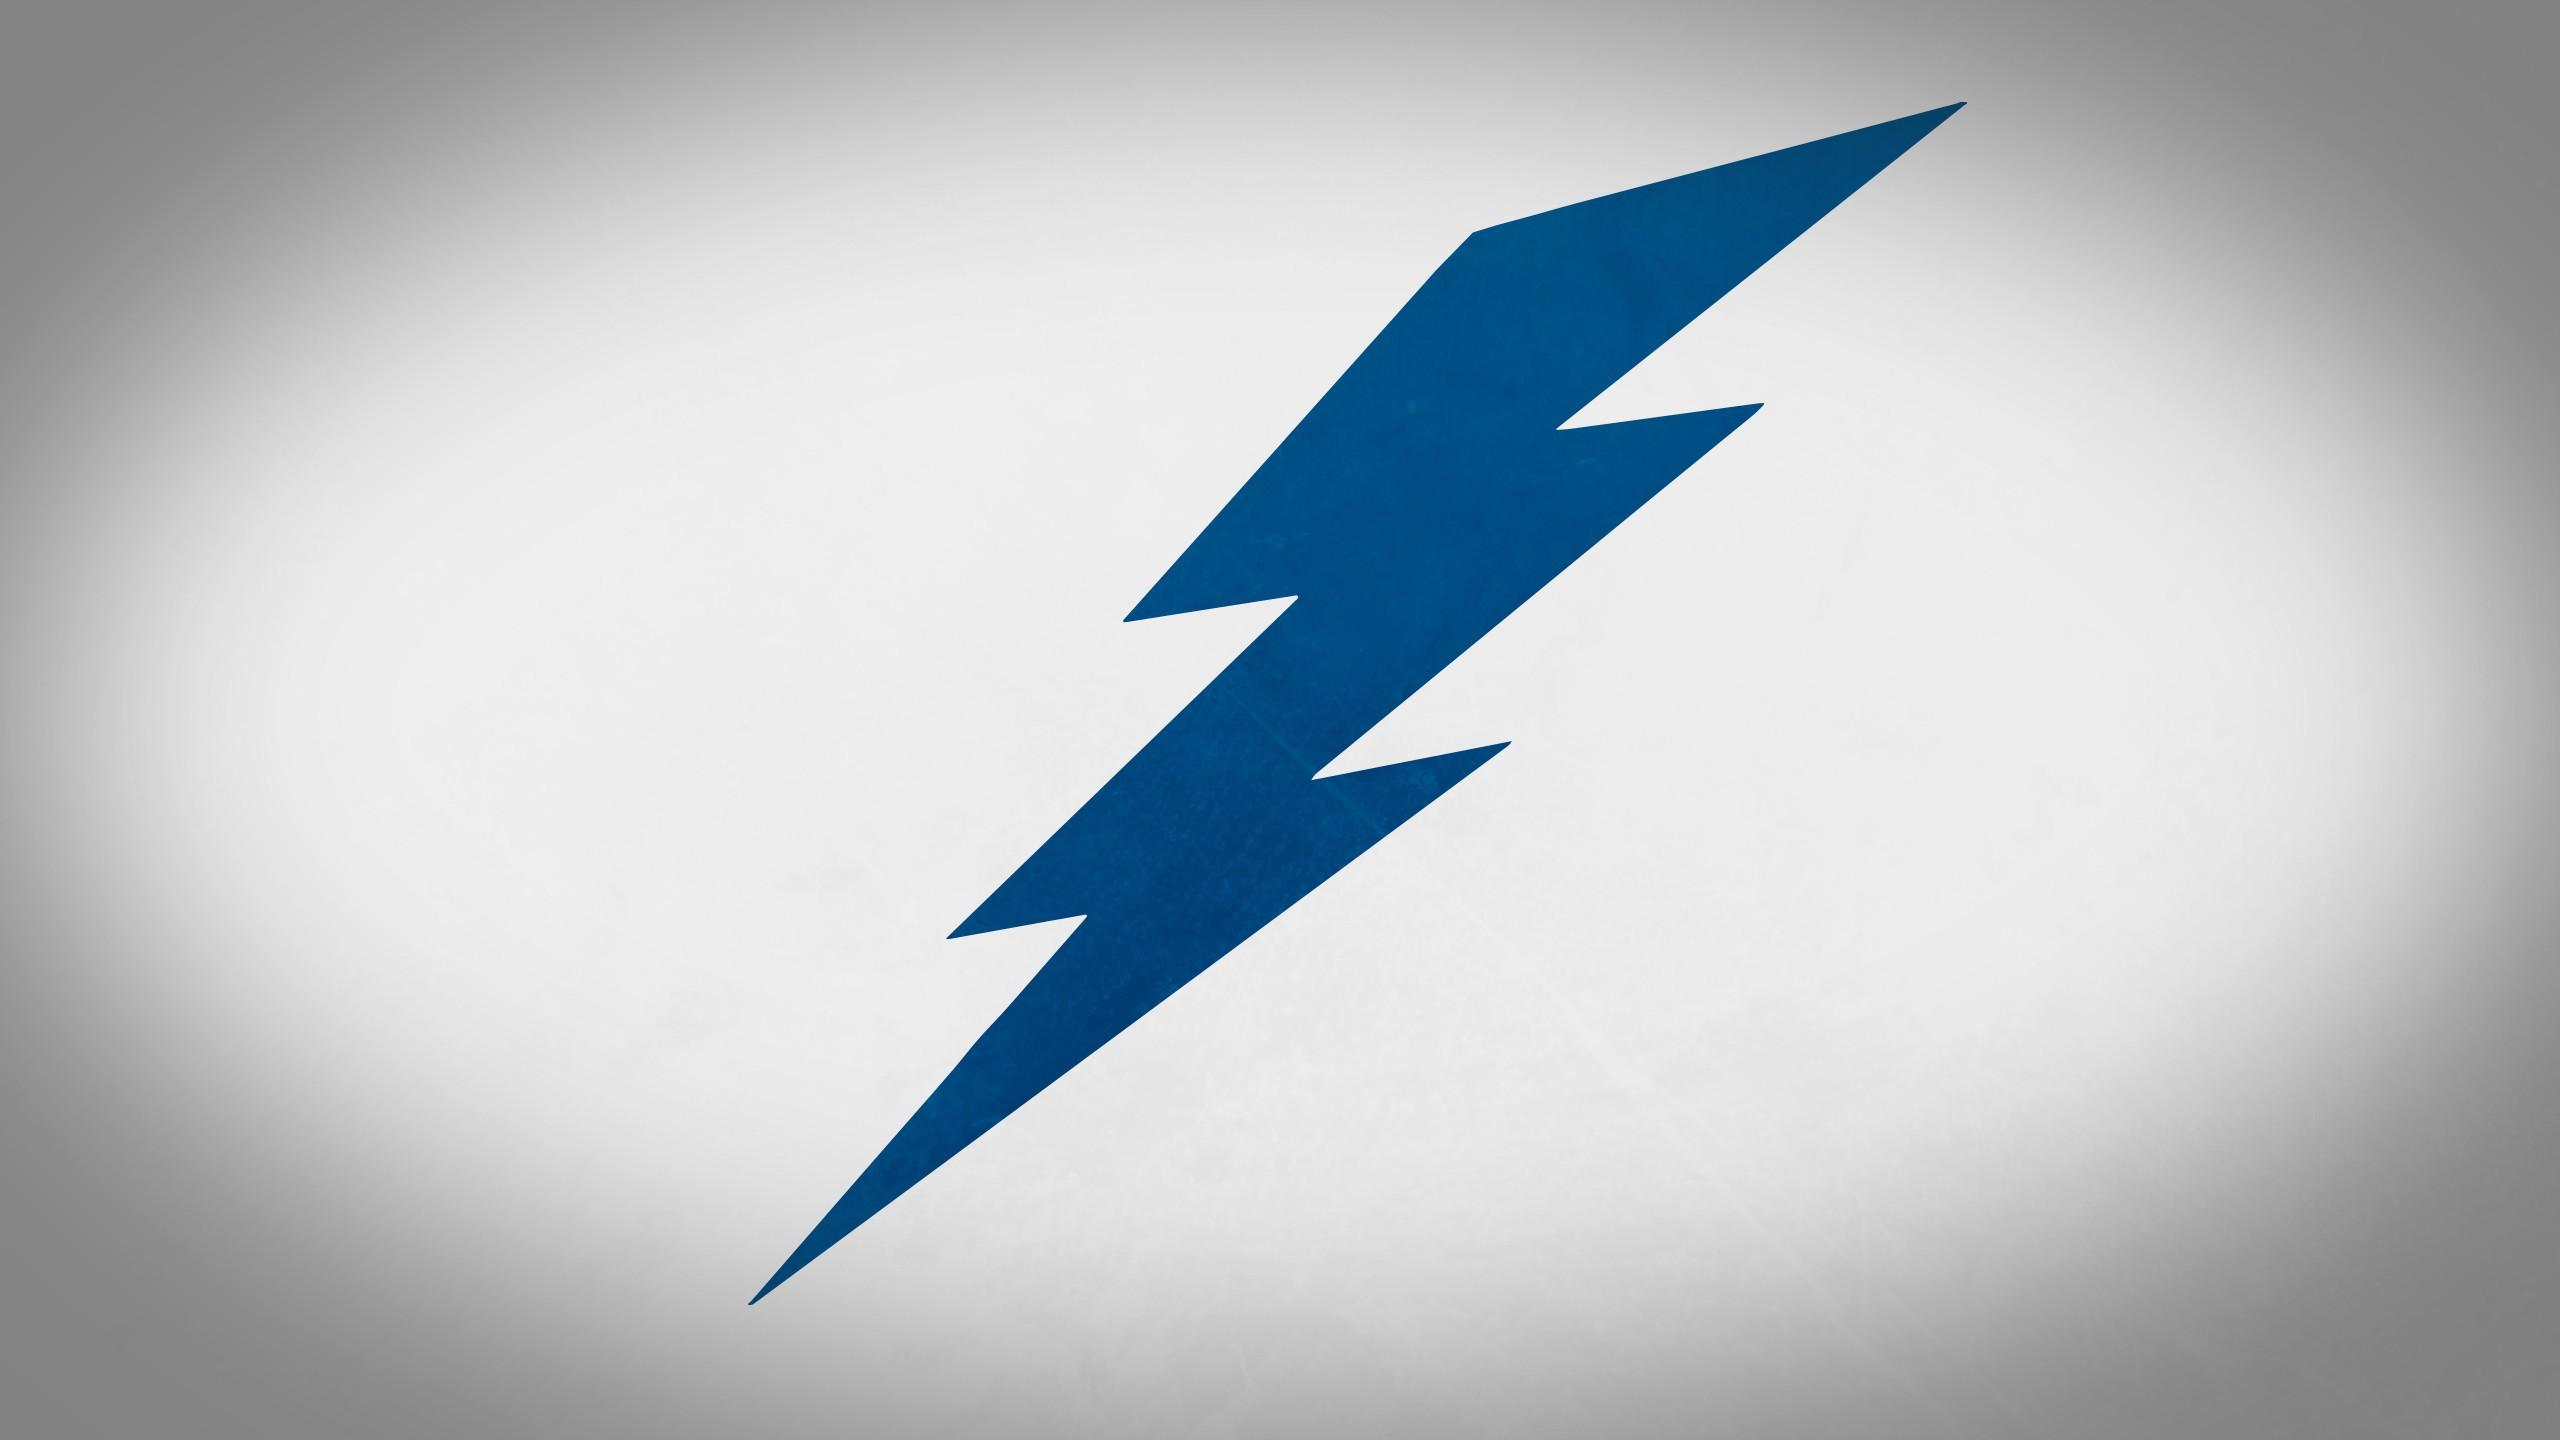 Tampa Bay Lightning Logo wallpaper   1434908 2560x1440